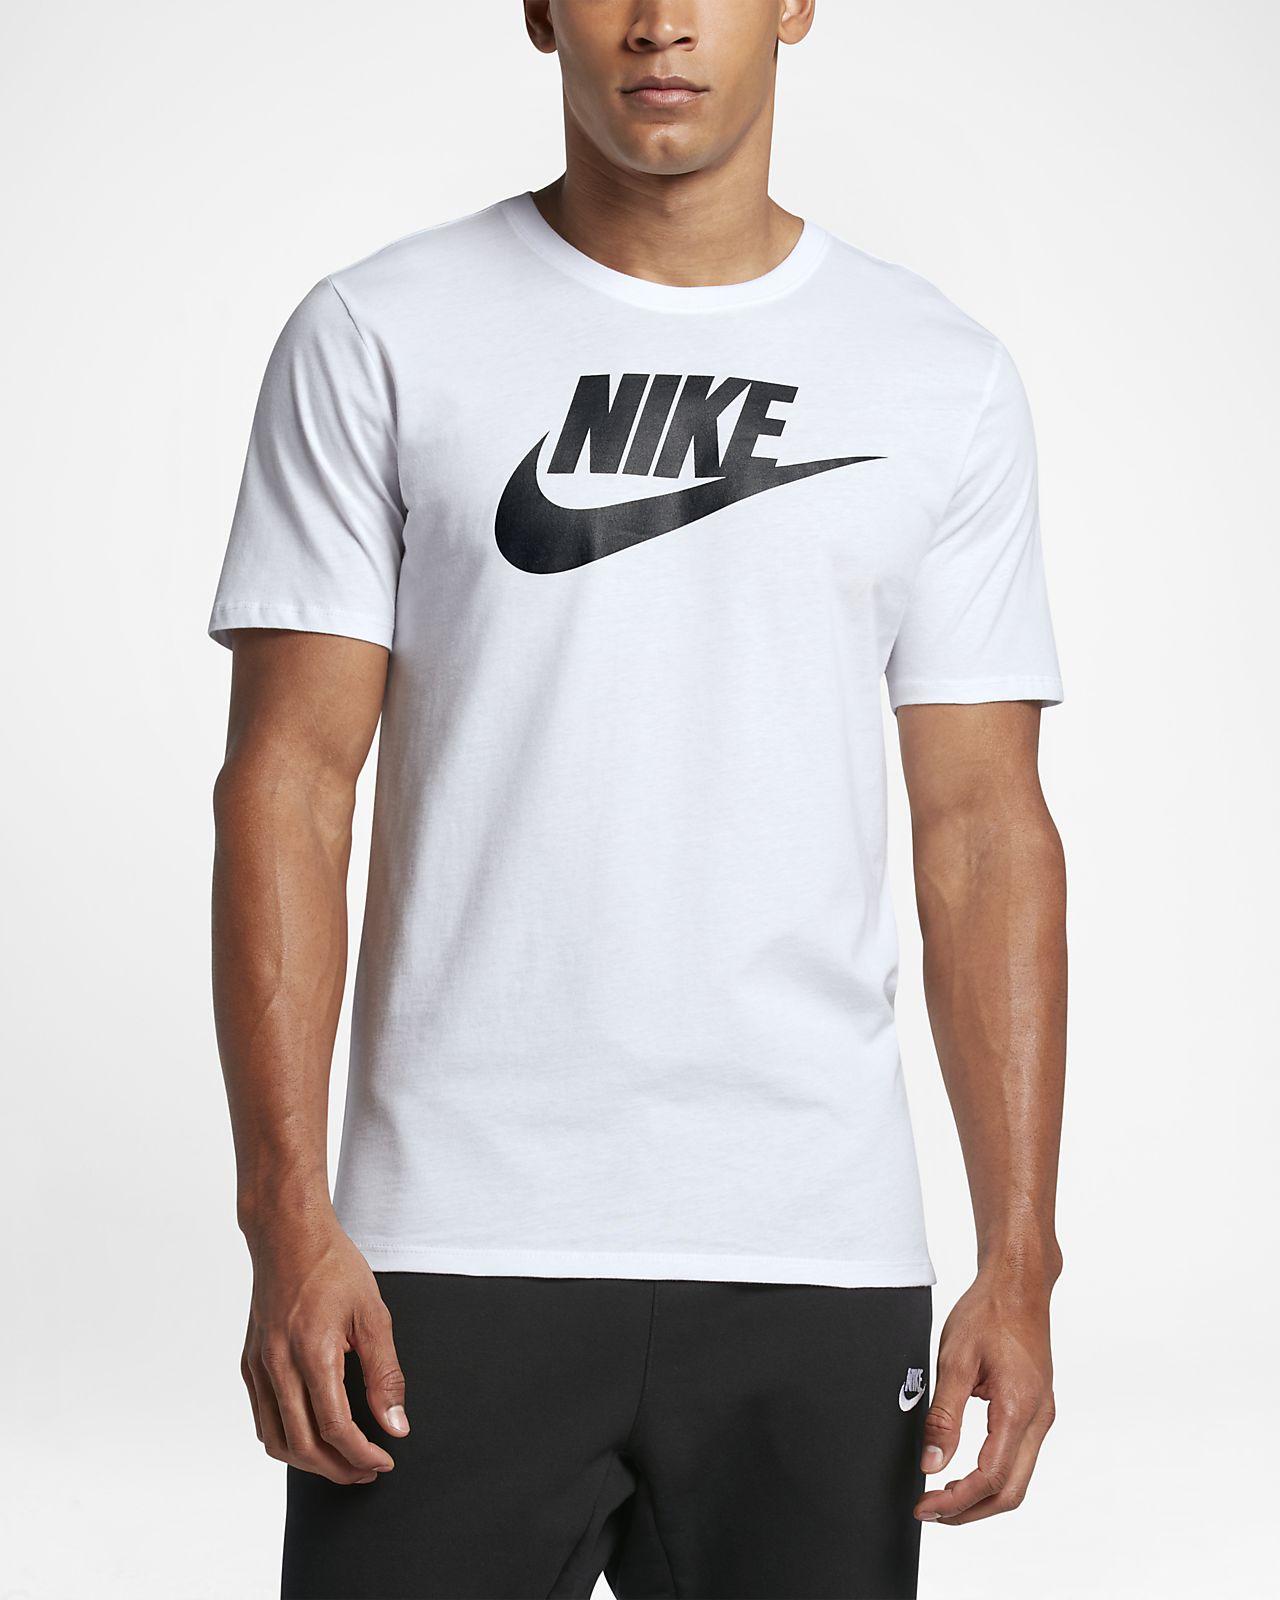 Nike Sportswear Mens Logo T Shirt